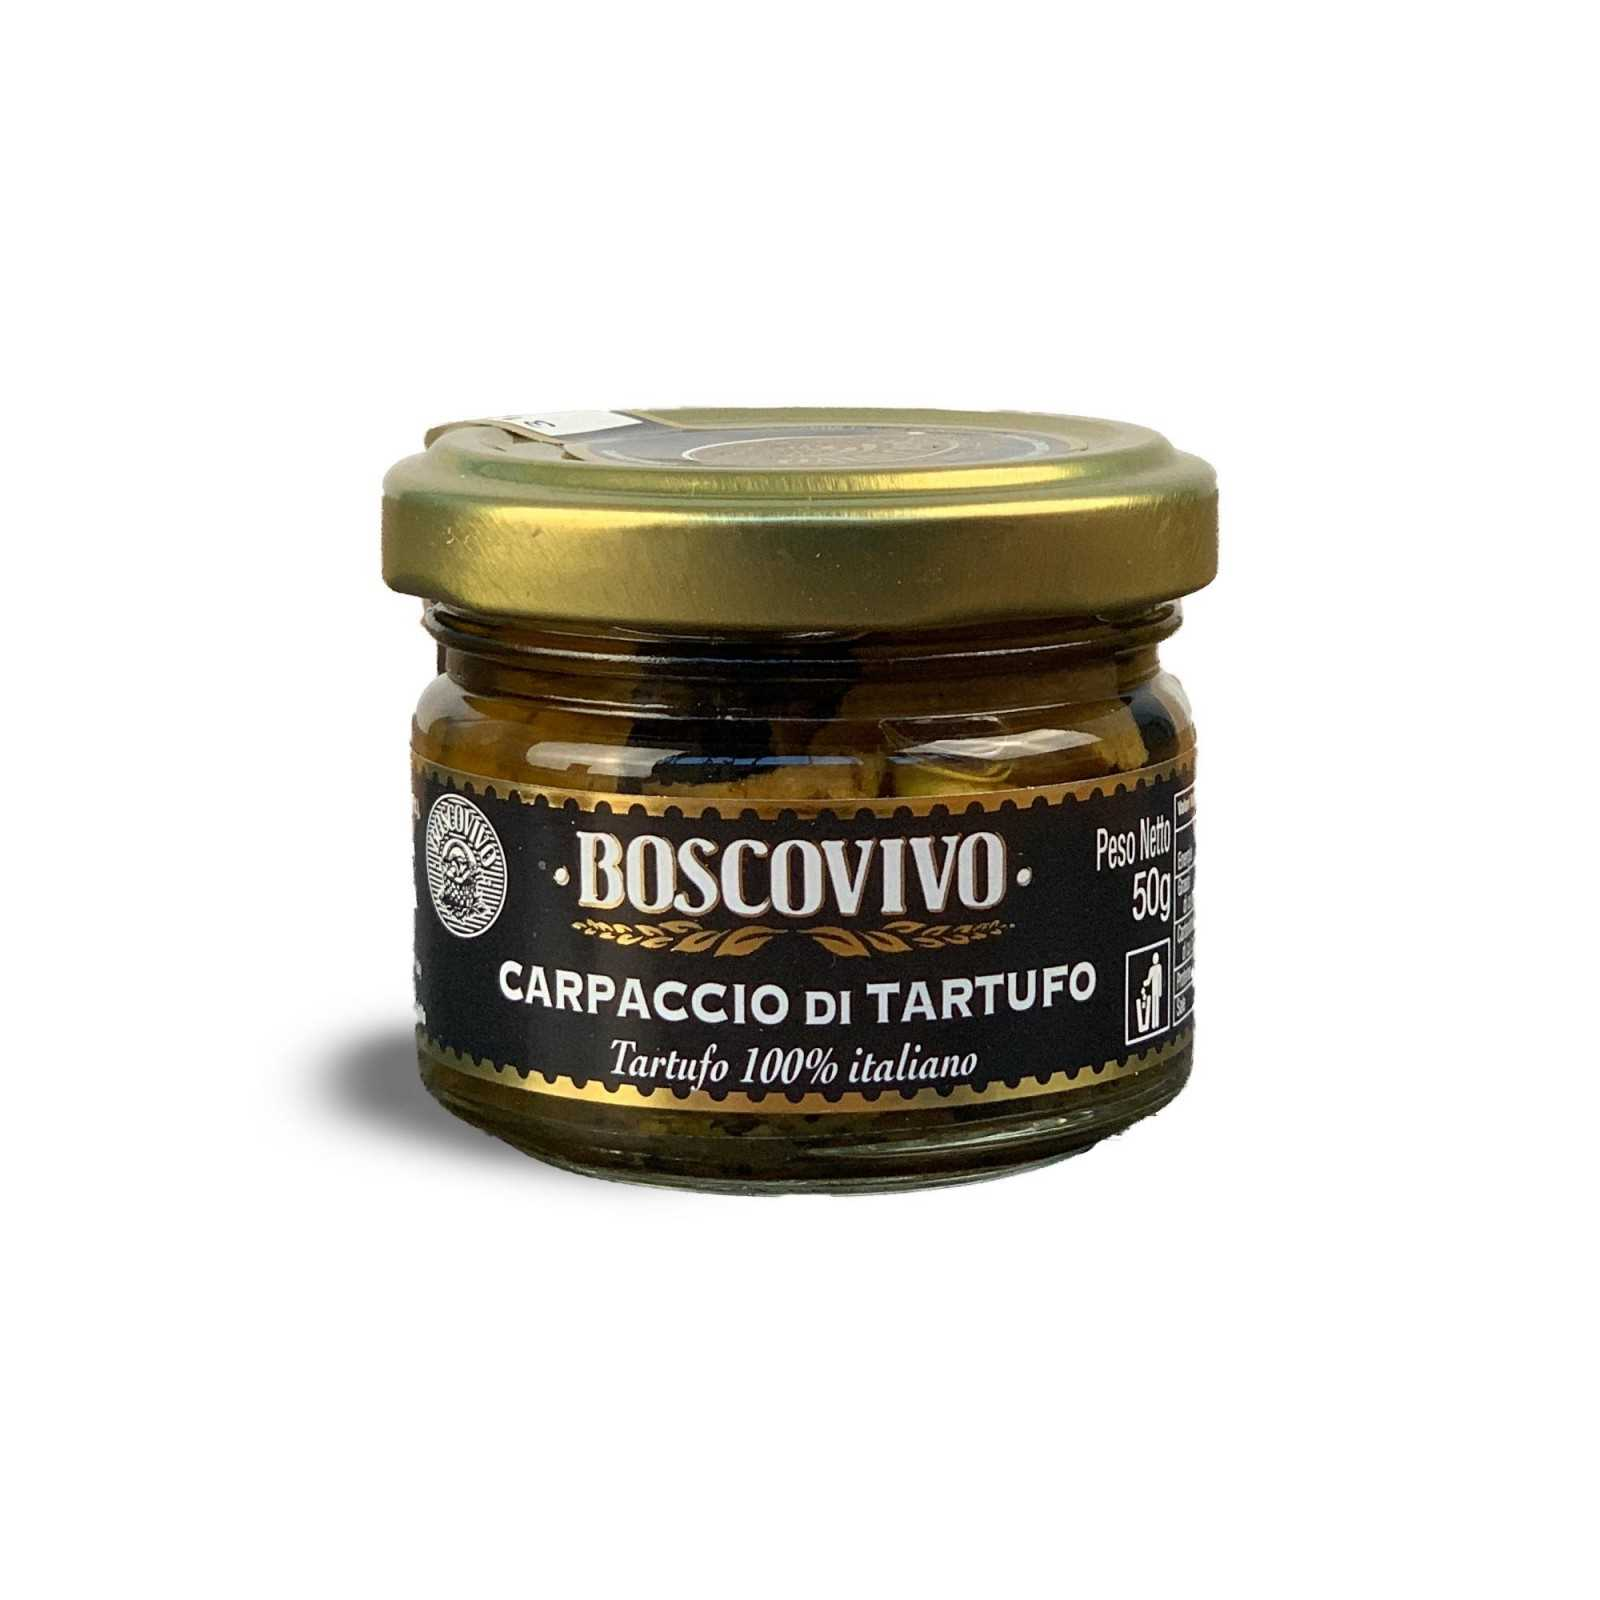 Black Summer Truffle Carpaccio - Tuber Aestivum Vitt. - 100% Italian.